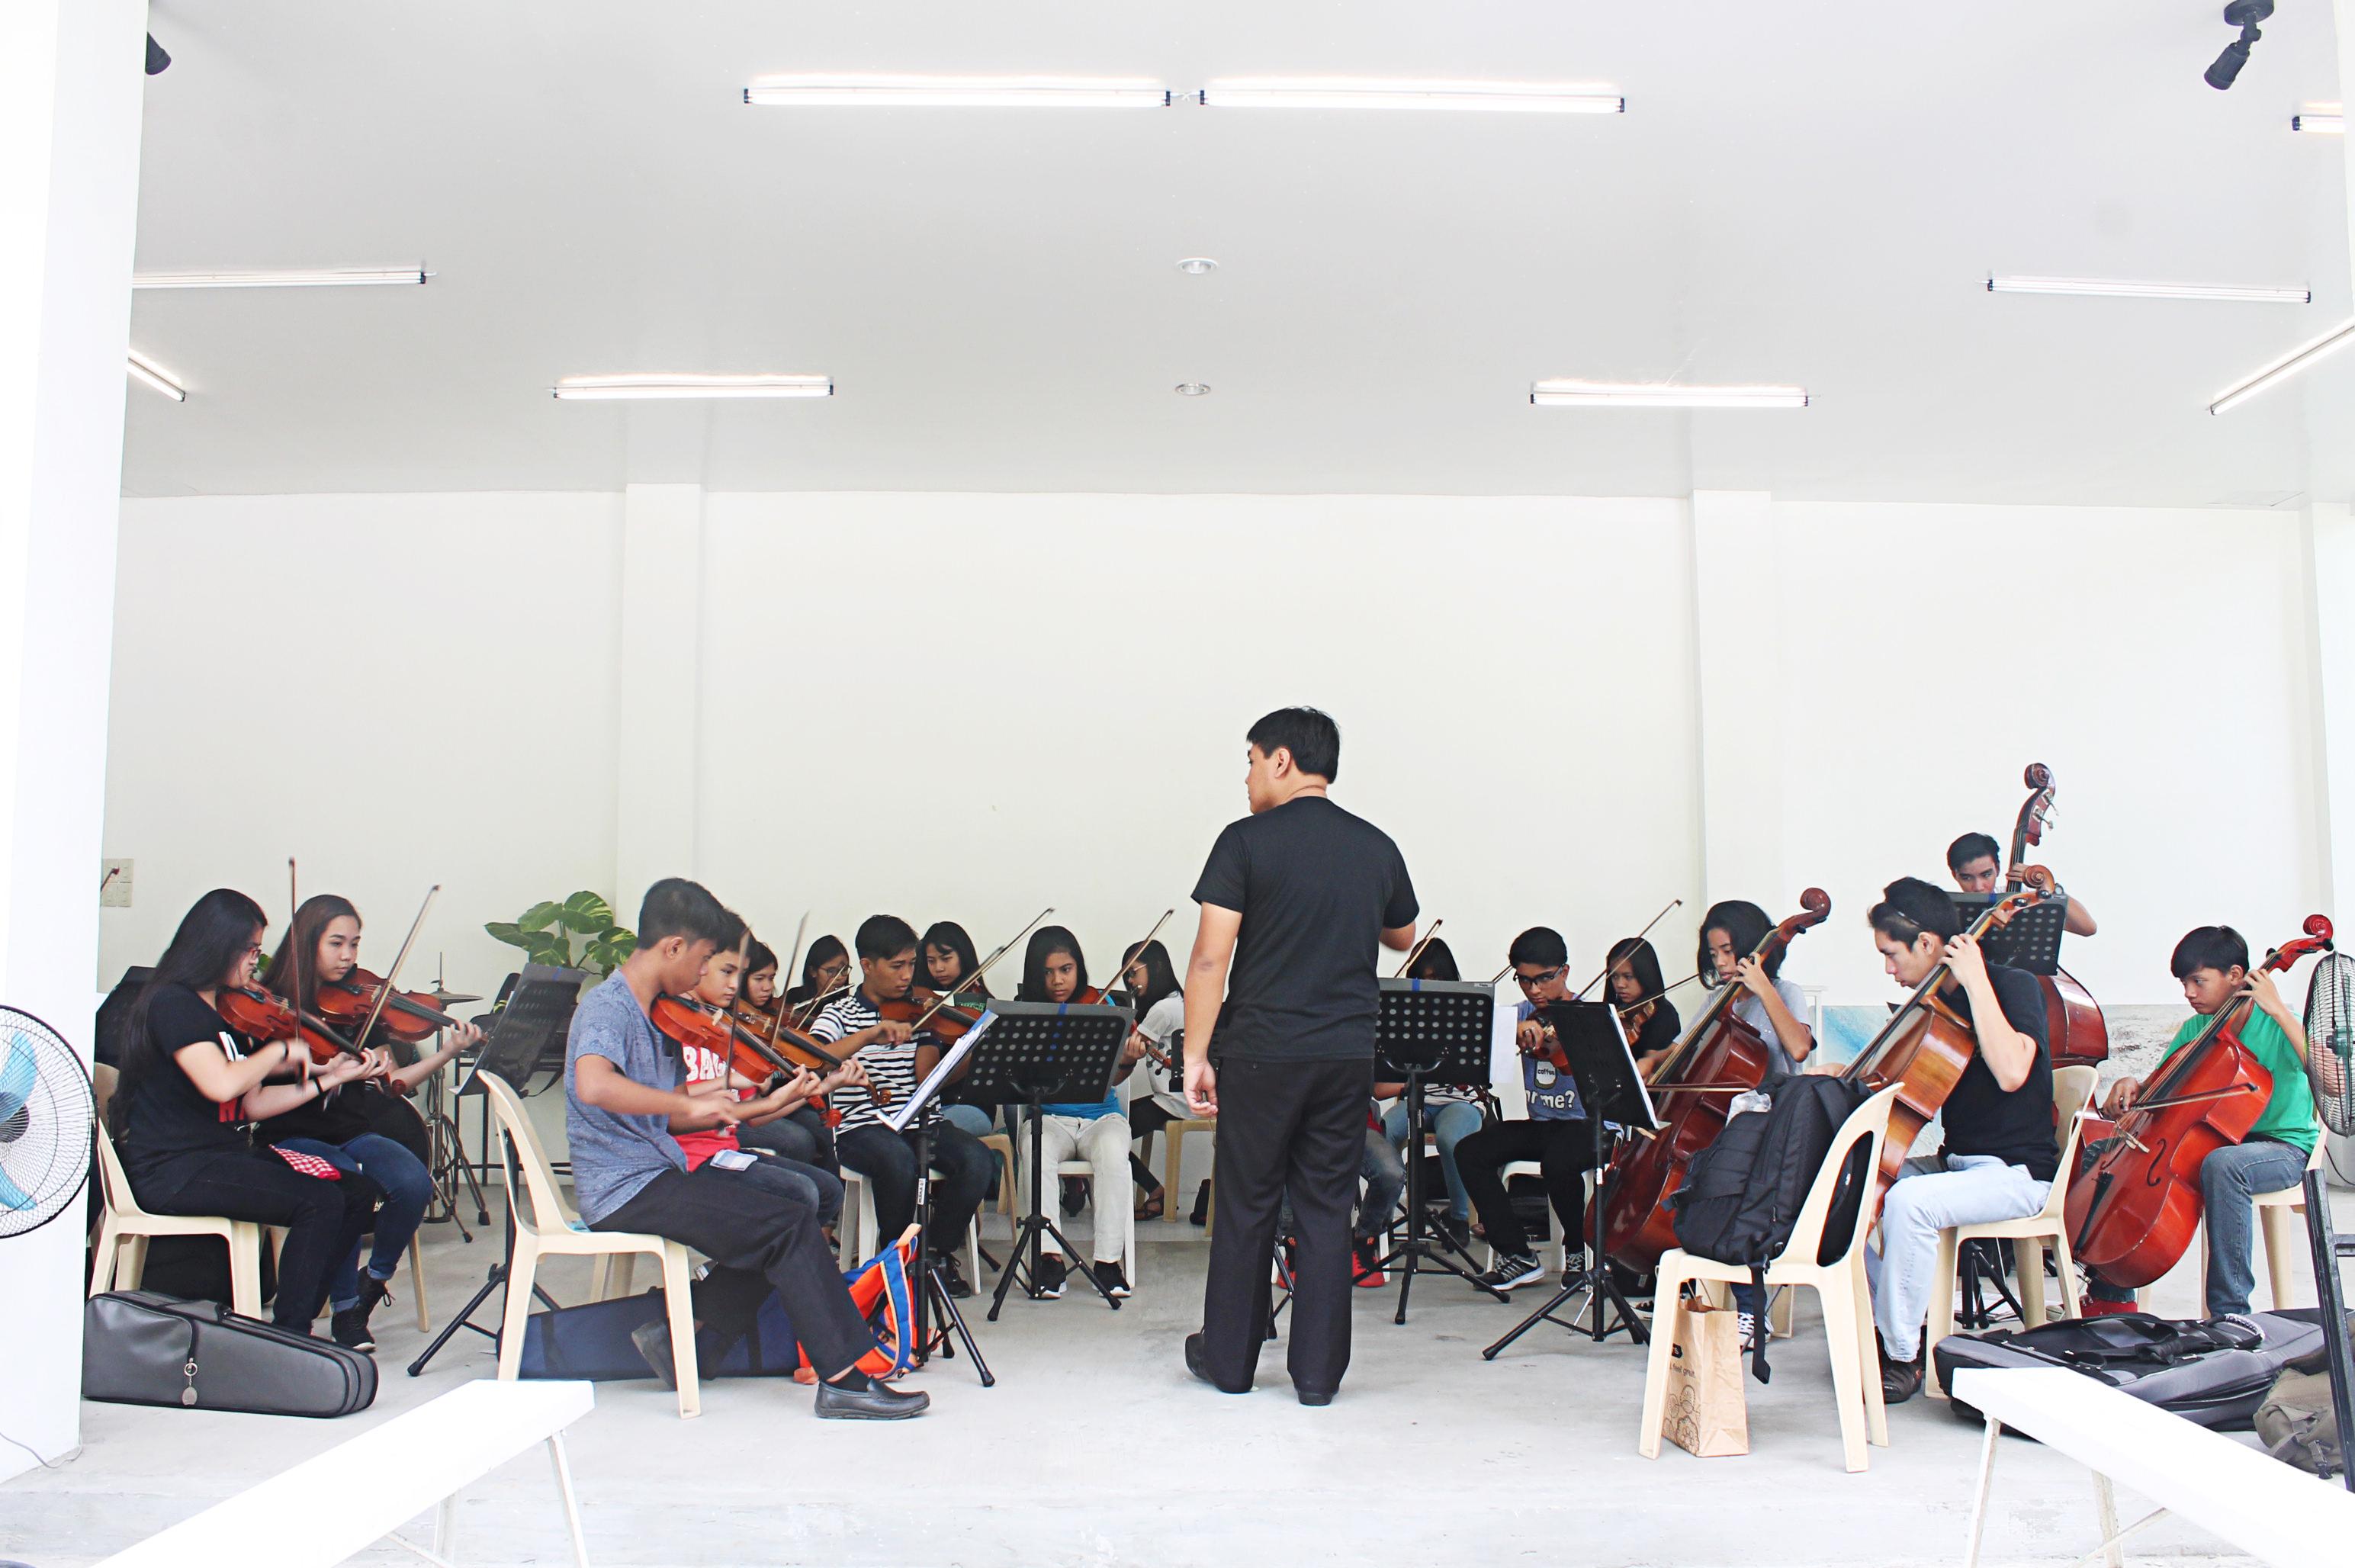 RLSAA Orchestra's rehearsal